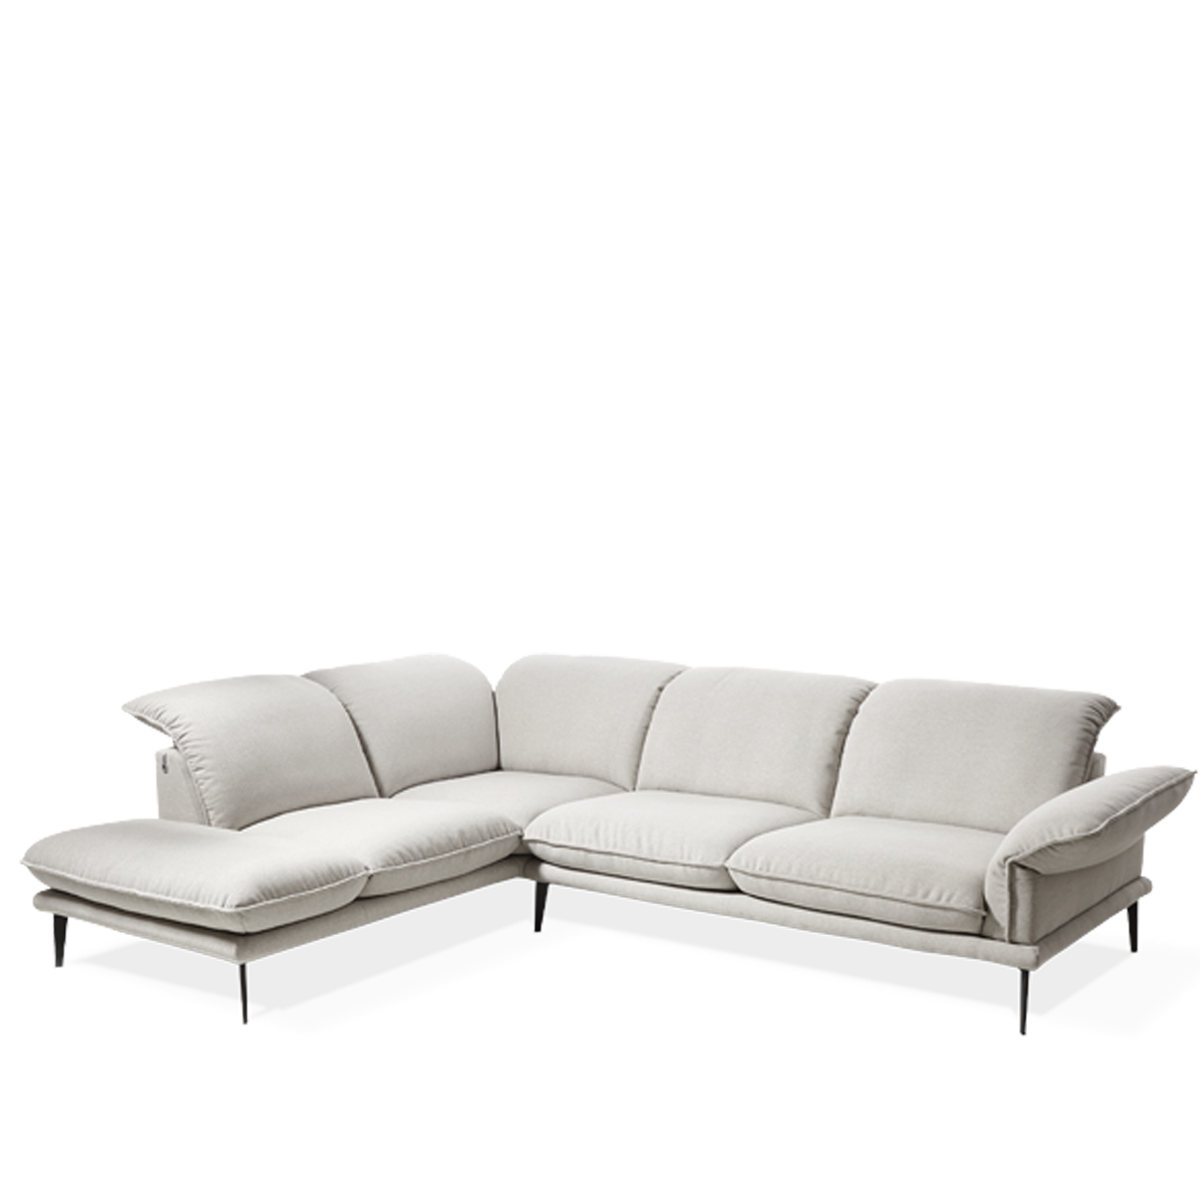 w schillig ecksofa sherry 24600 in l form mit hockerabschluss links. Black Bedroom Furniture Sets. Home Design Ideas